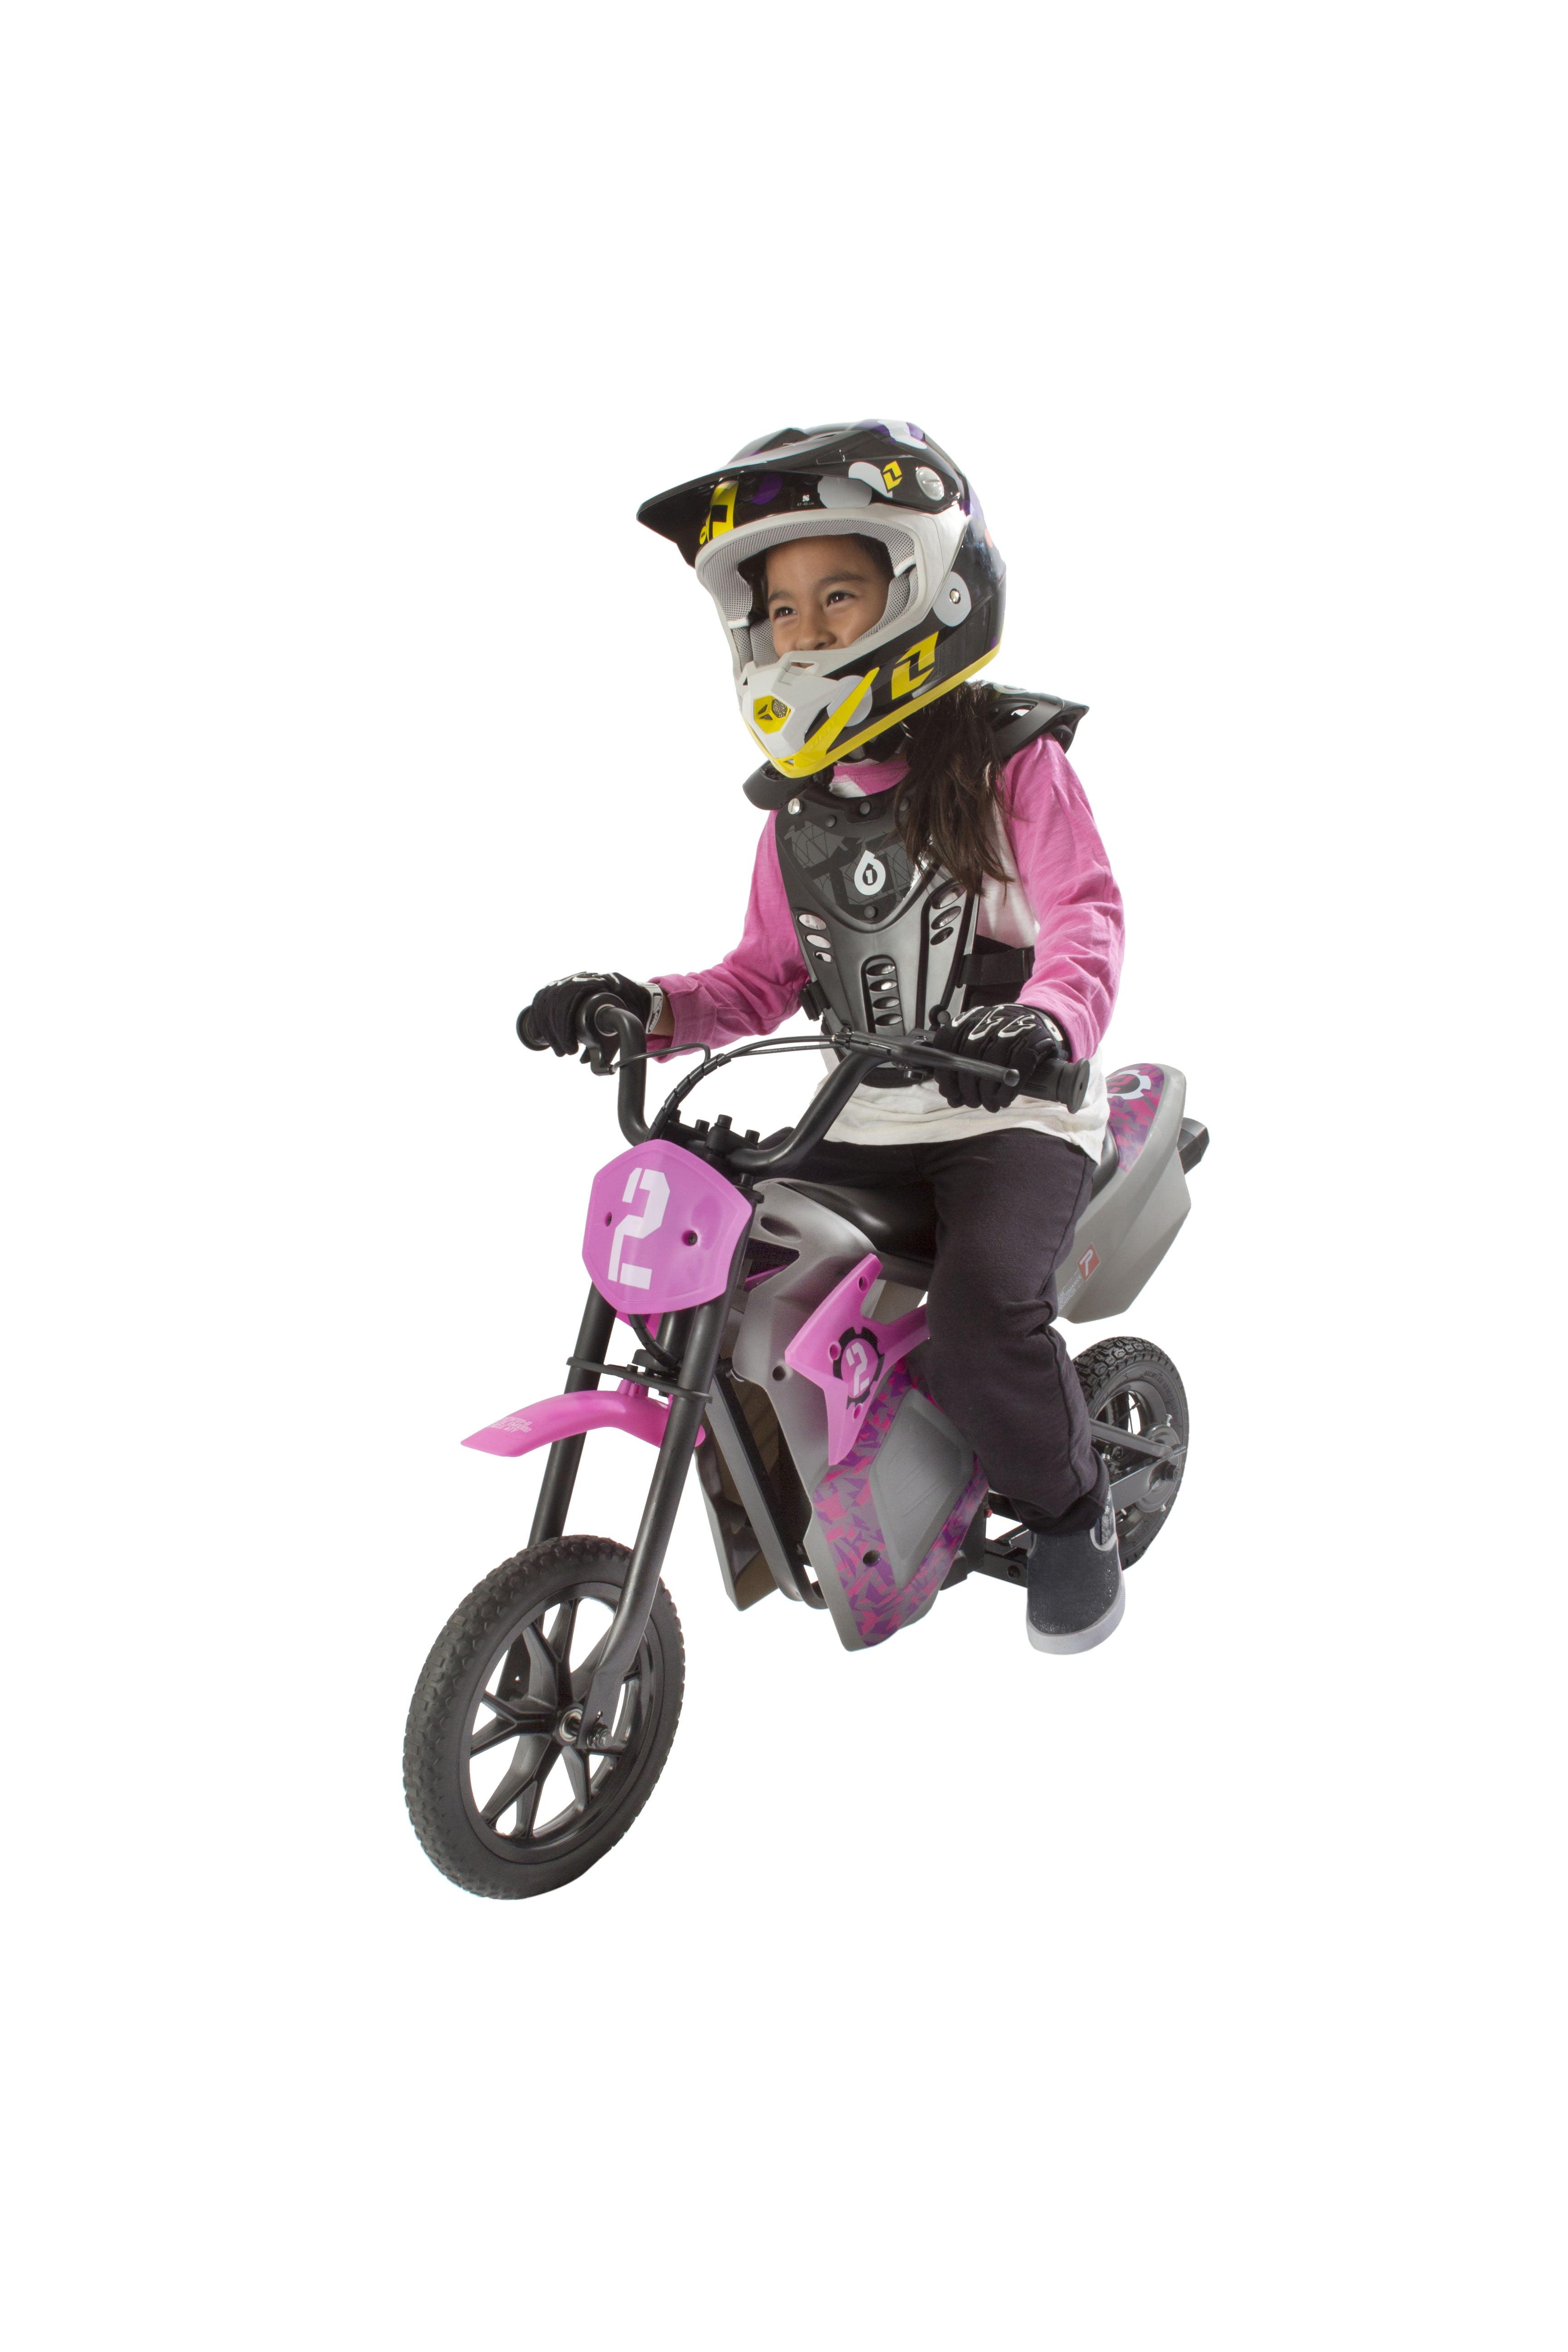 Pulse Performance Em 1000 Electric Dirt Bike Pink Walmart Com Walmart Com